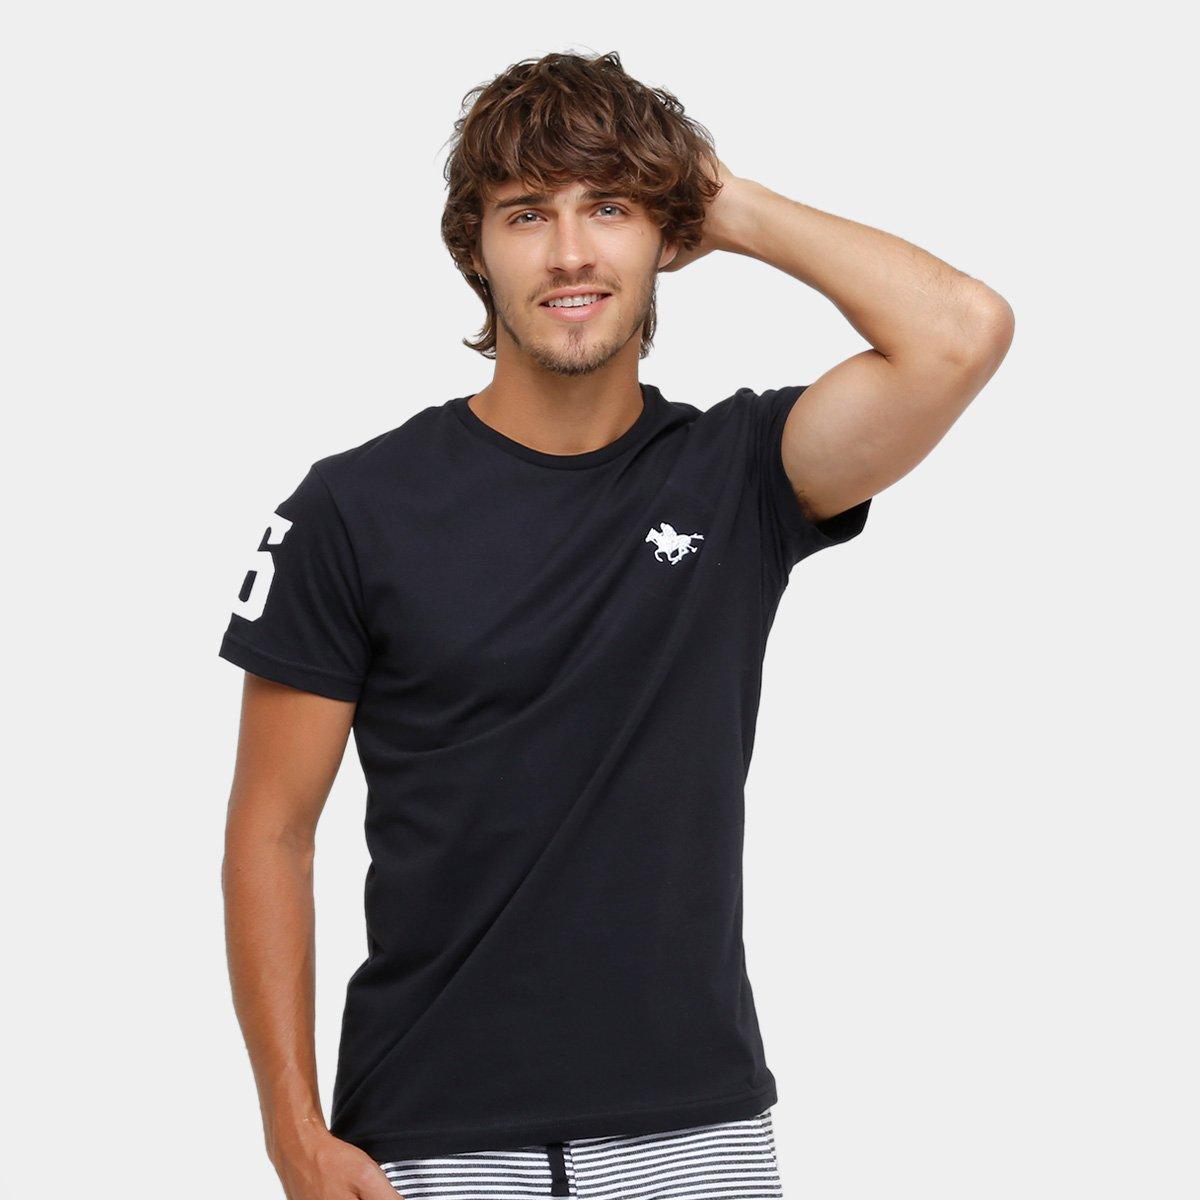 bafb21614b Camiseta RG 518 Básica Bordada Masculina - Tam: P - Shopping TudoAzul